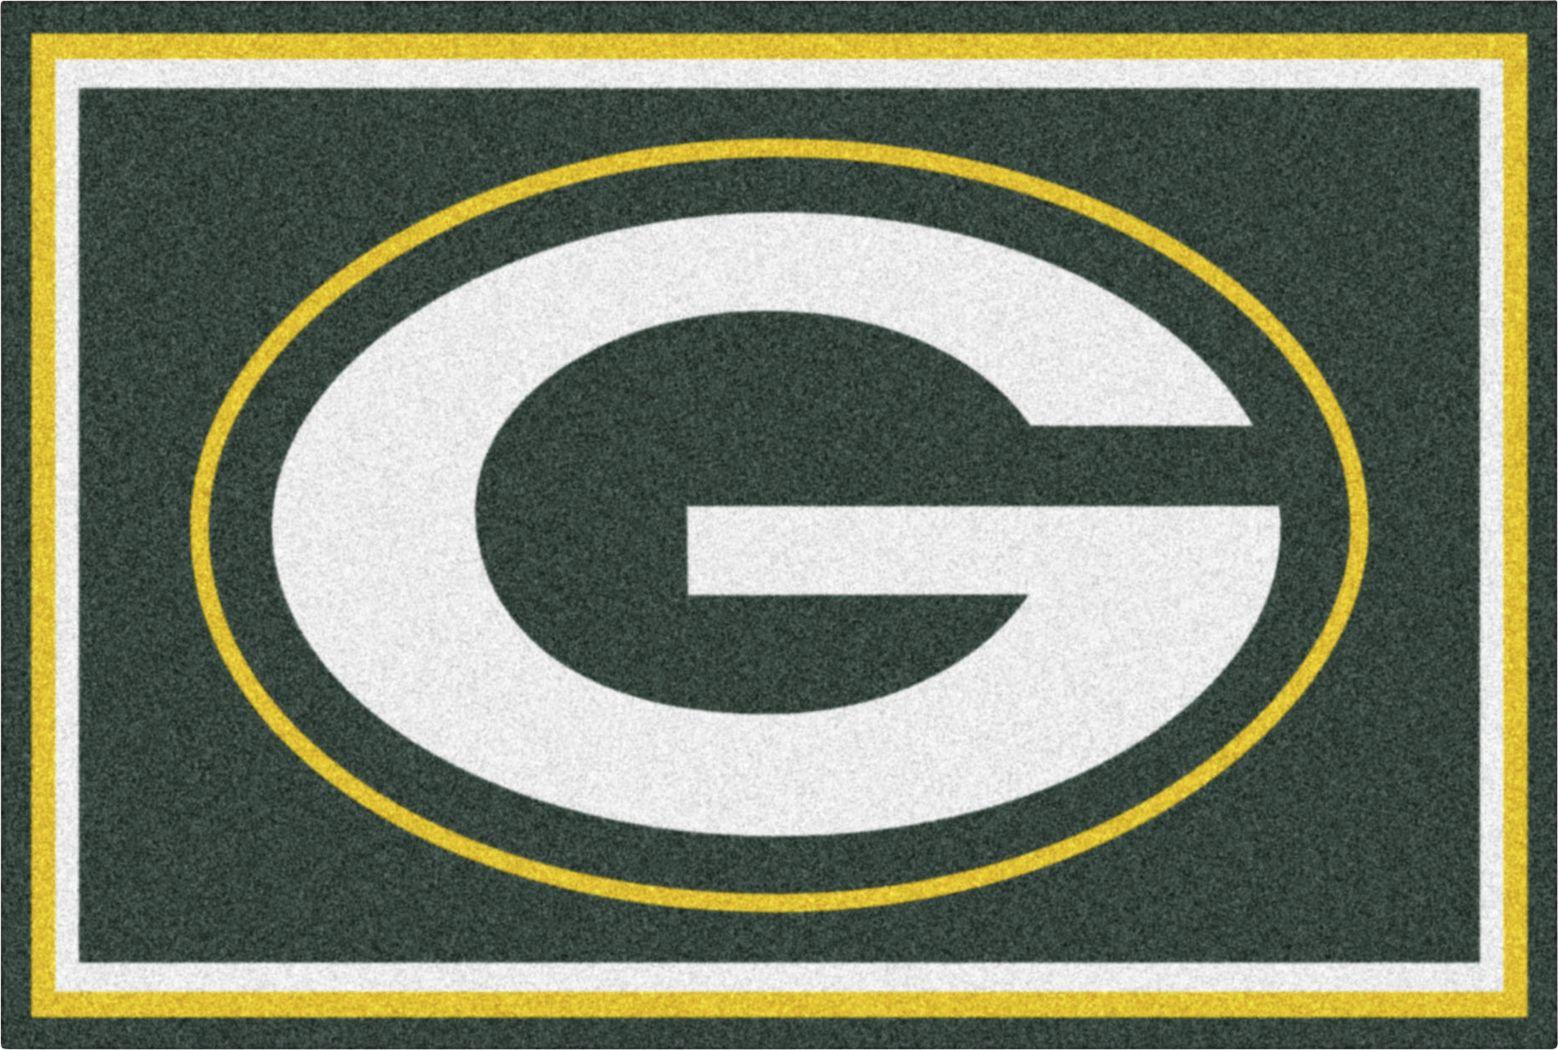 NFL Big Game Green Bay Packers 5' x 8' Rug